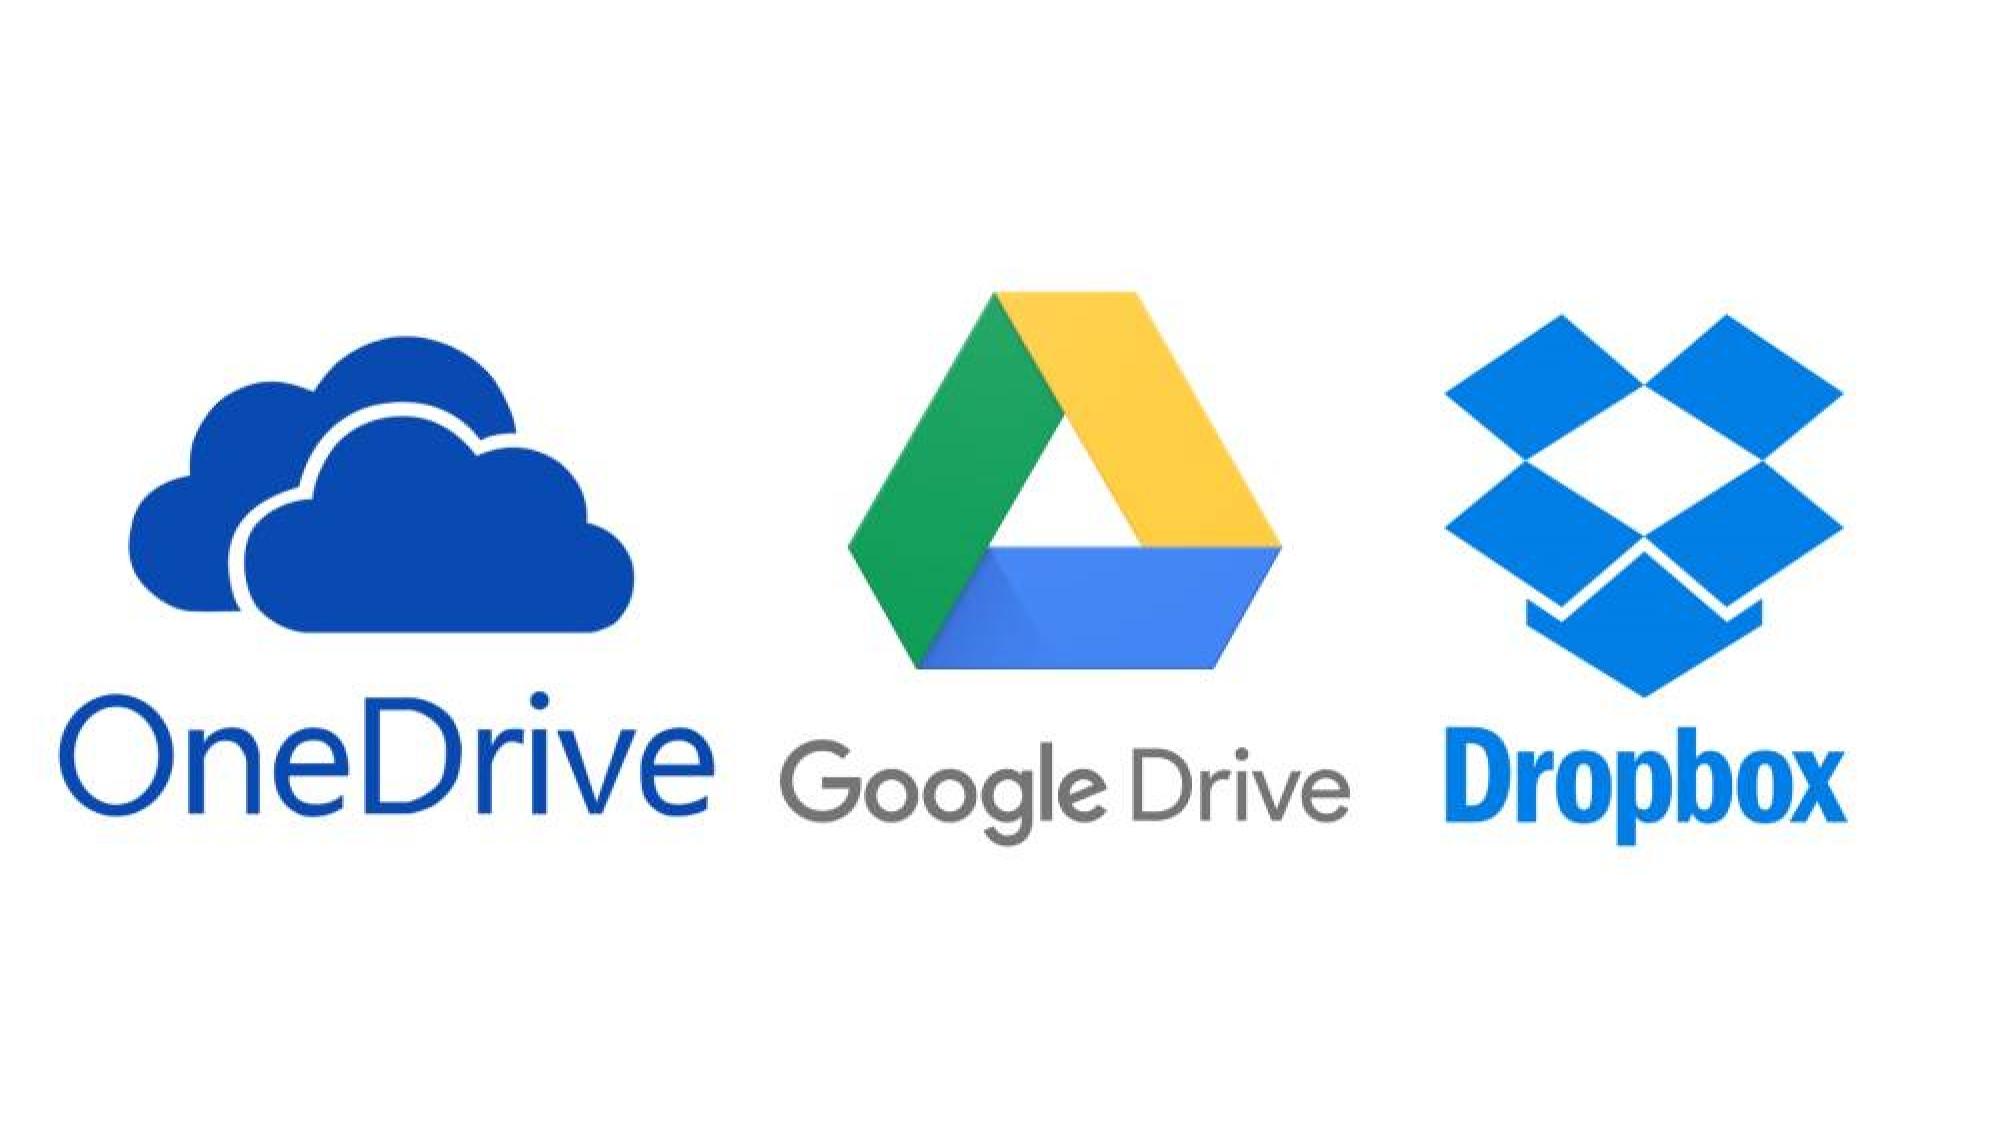 OneDrive-Google Drive-Dropbox